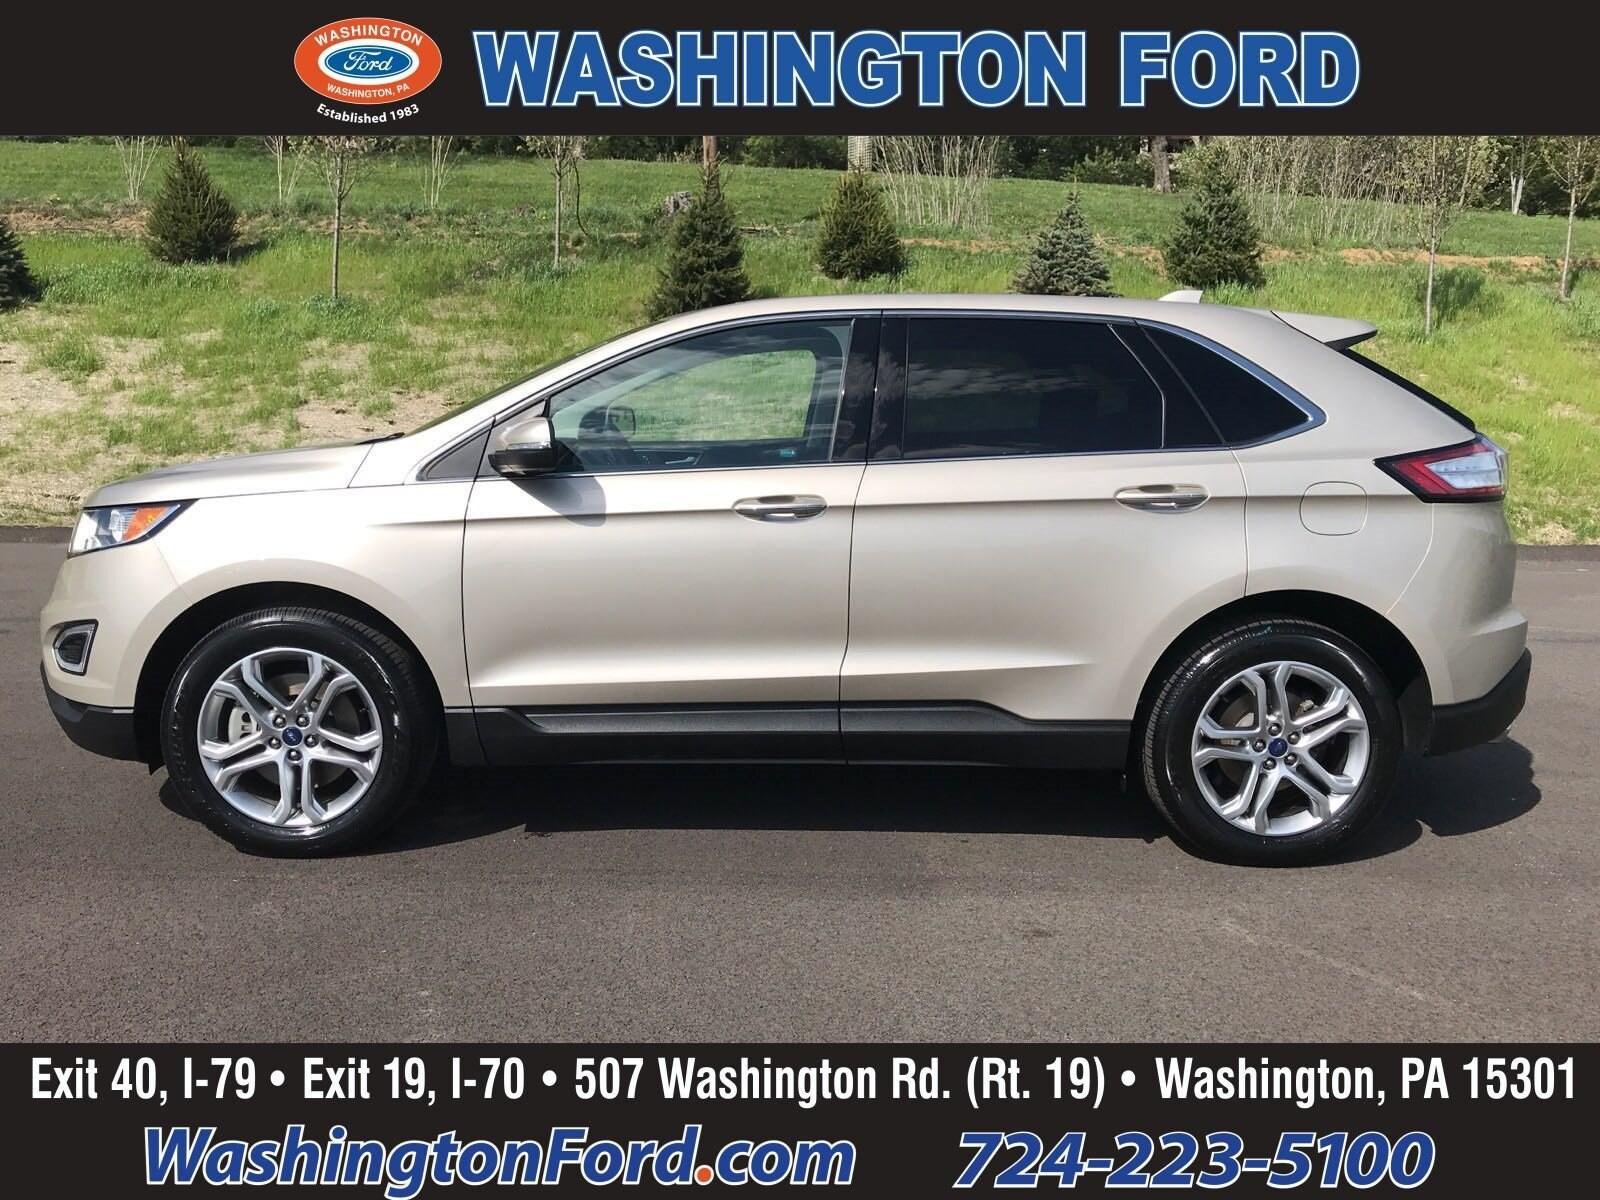 2017 Ford Edge AWD-TITANIUM-CERTIFIED!! SUV